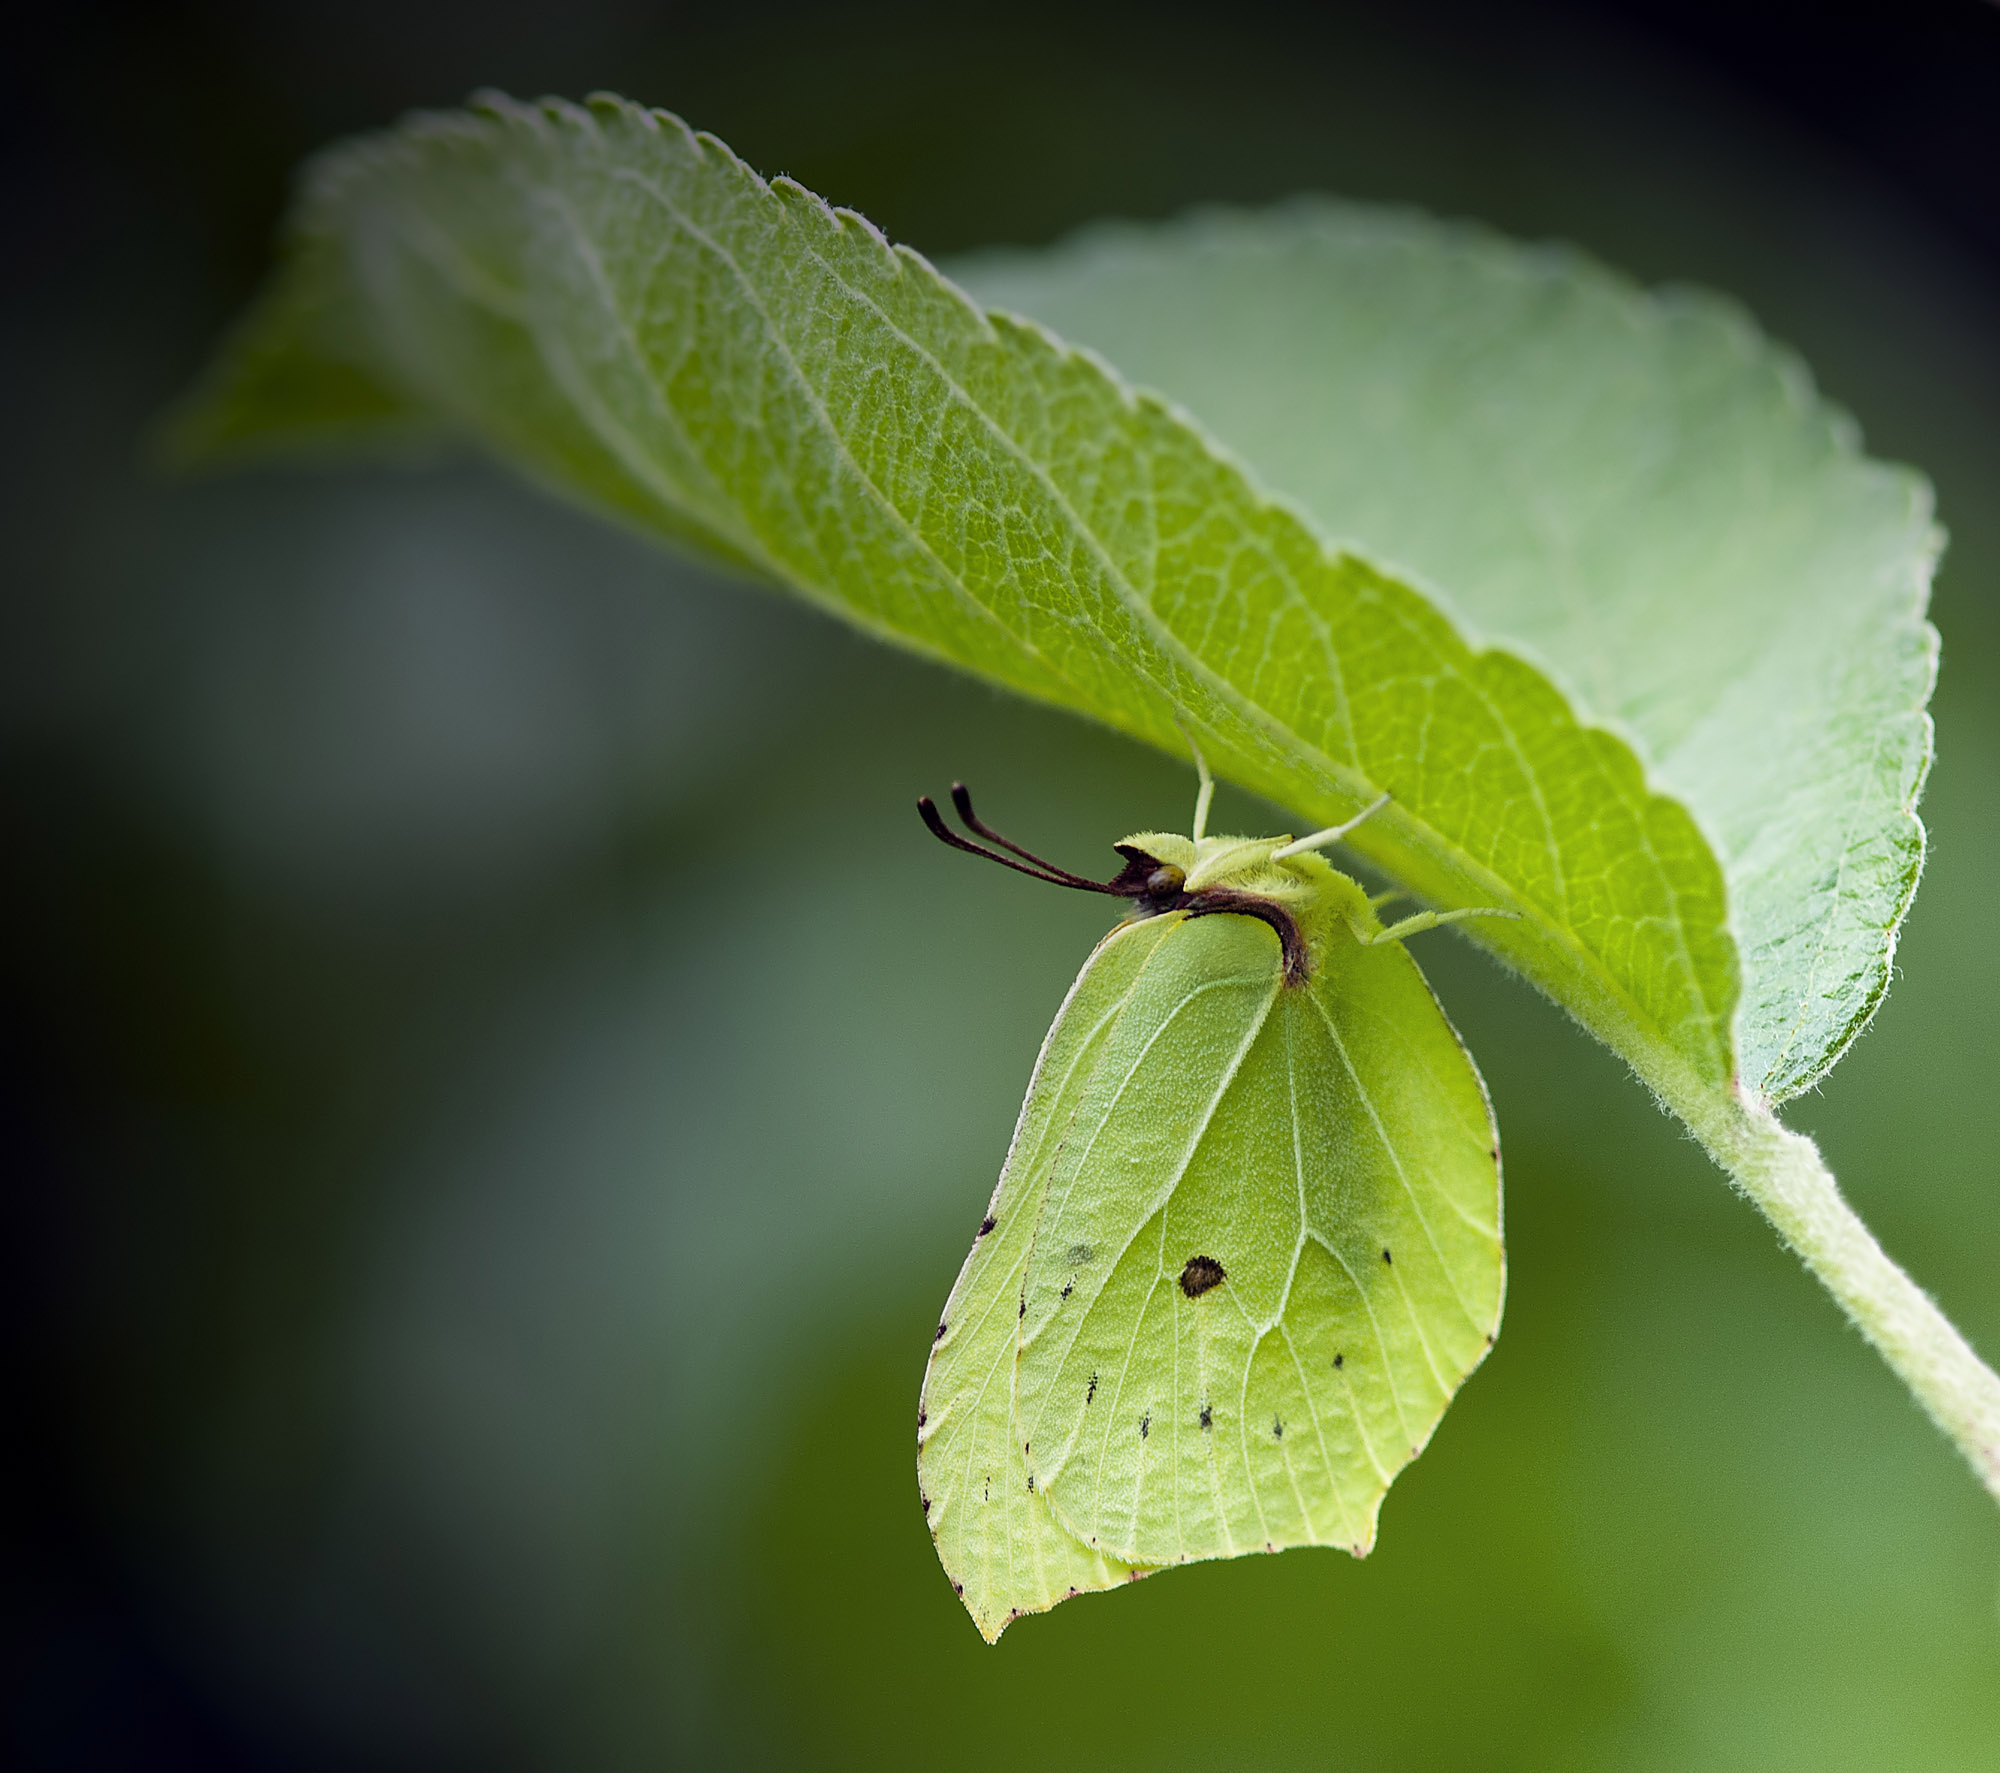 Sitronsommerfugl II